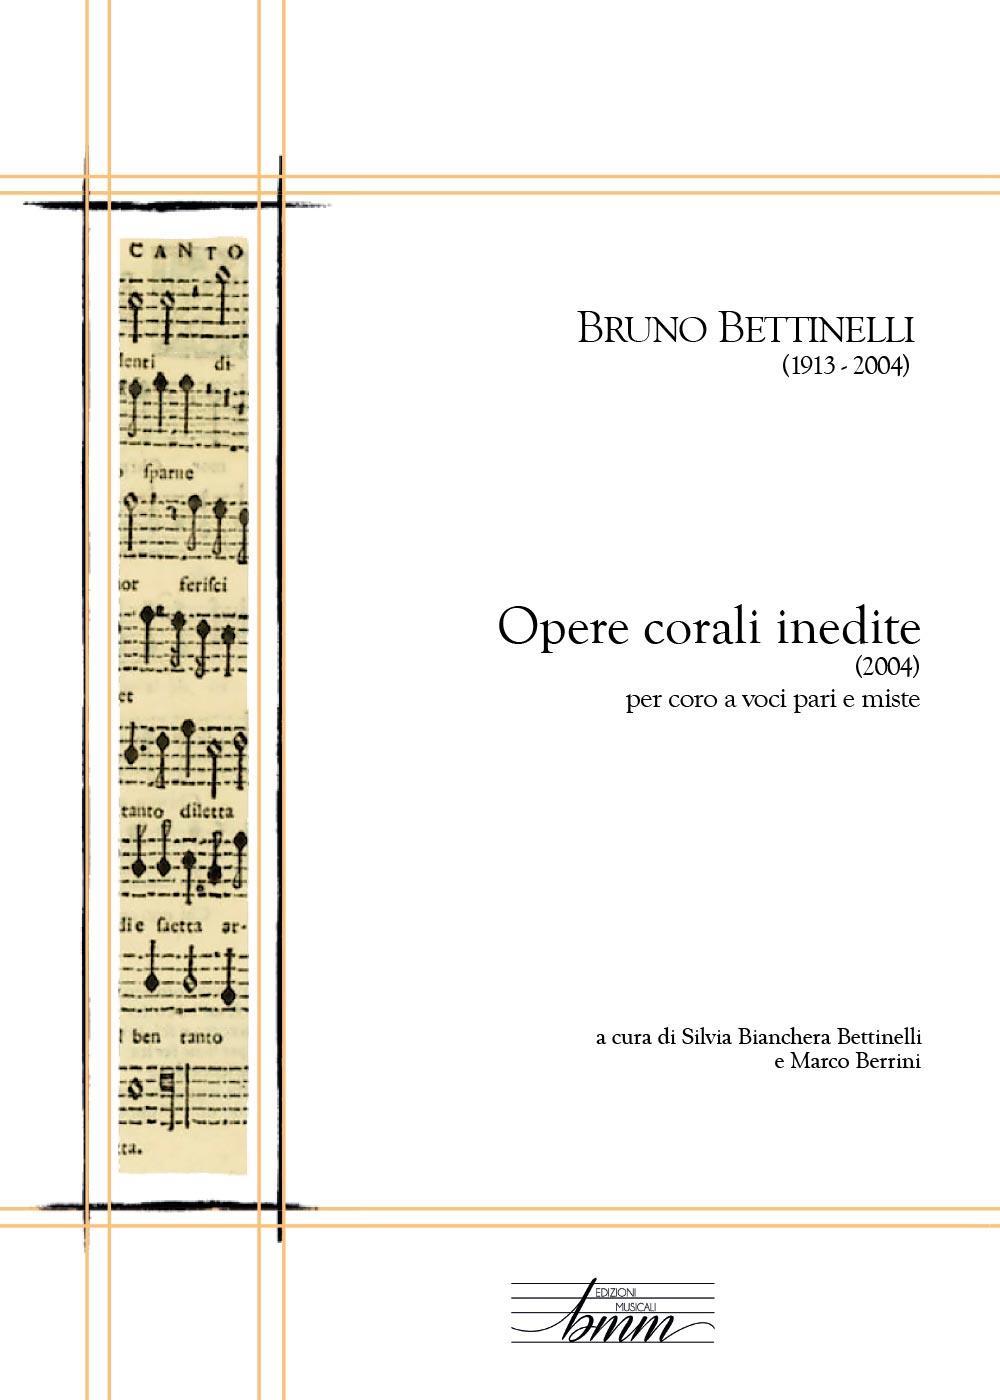 Bruno Bettinelli - Opere corali inedite